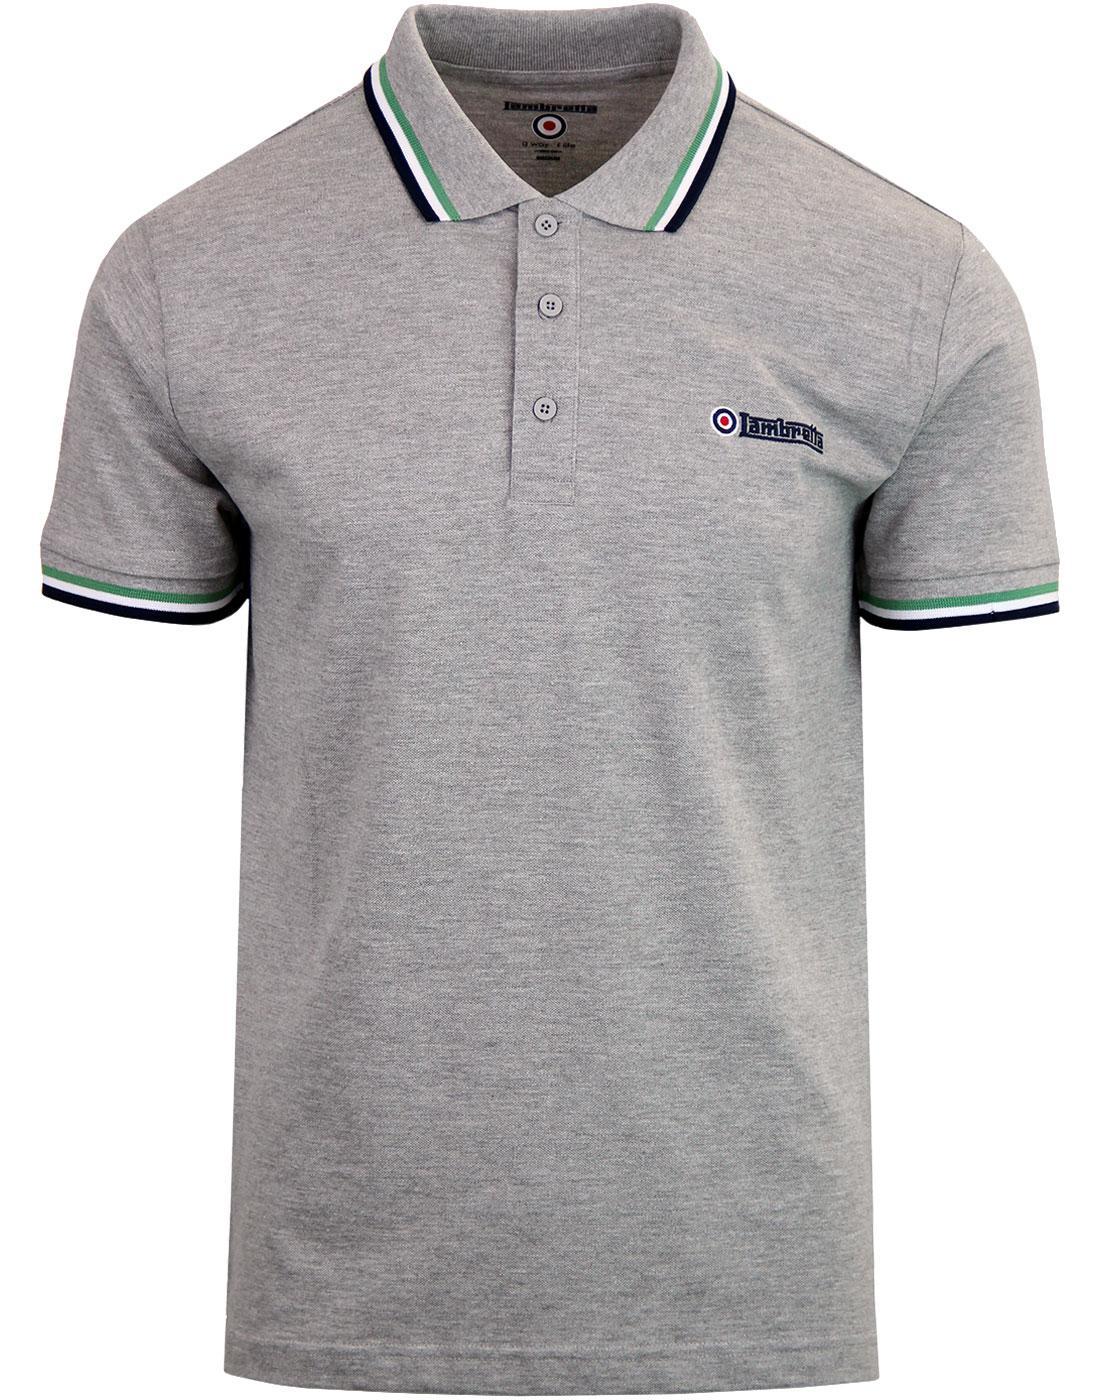 LAMBRETTA Retro Triple Tipped Pique Polo Shirt G